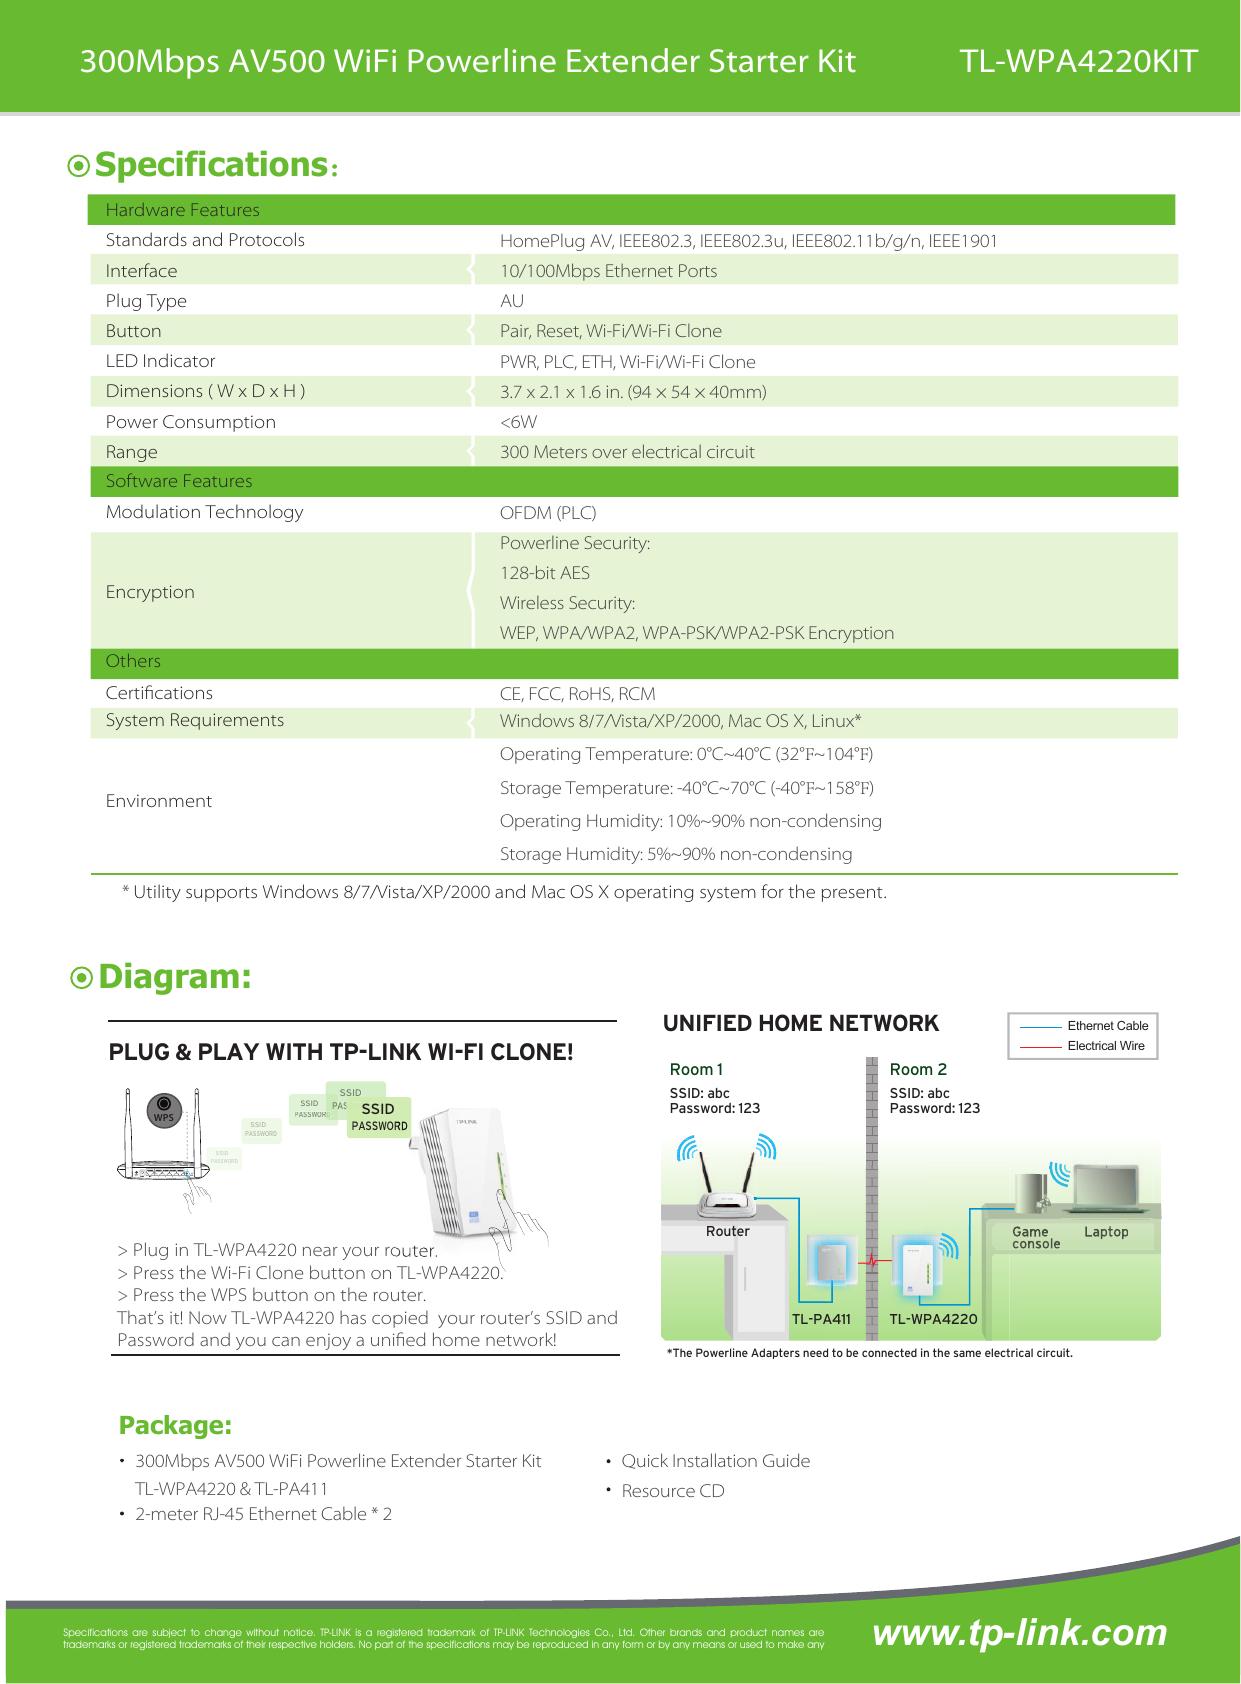 Page 2 of 2 - TL-WPA4220KIT(AU) 1.0  TL-WPA4220KIT(AU V1 Datasheet